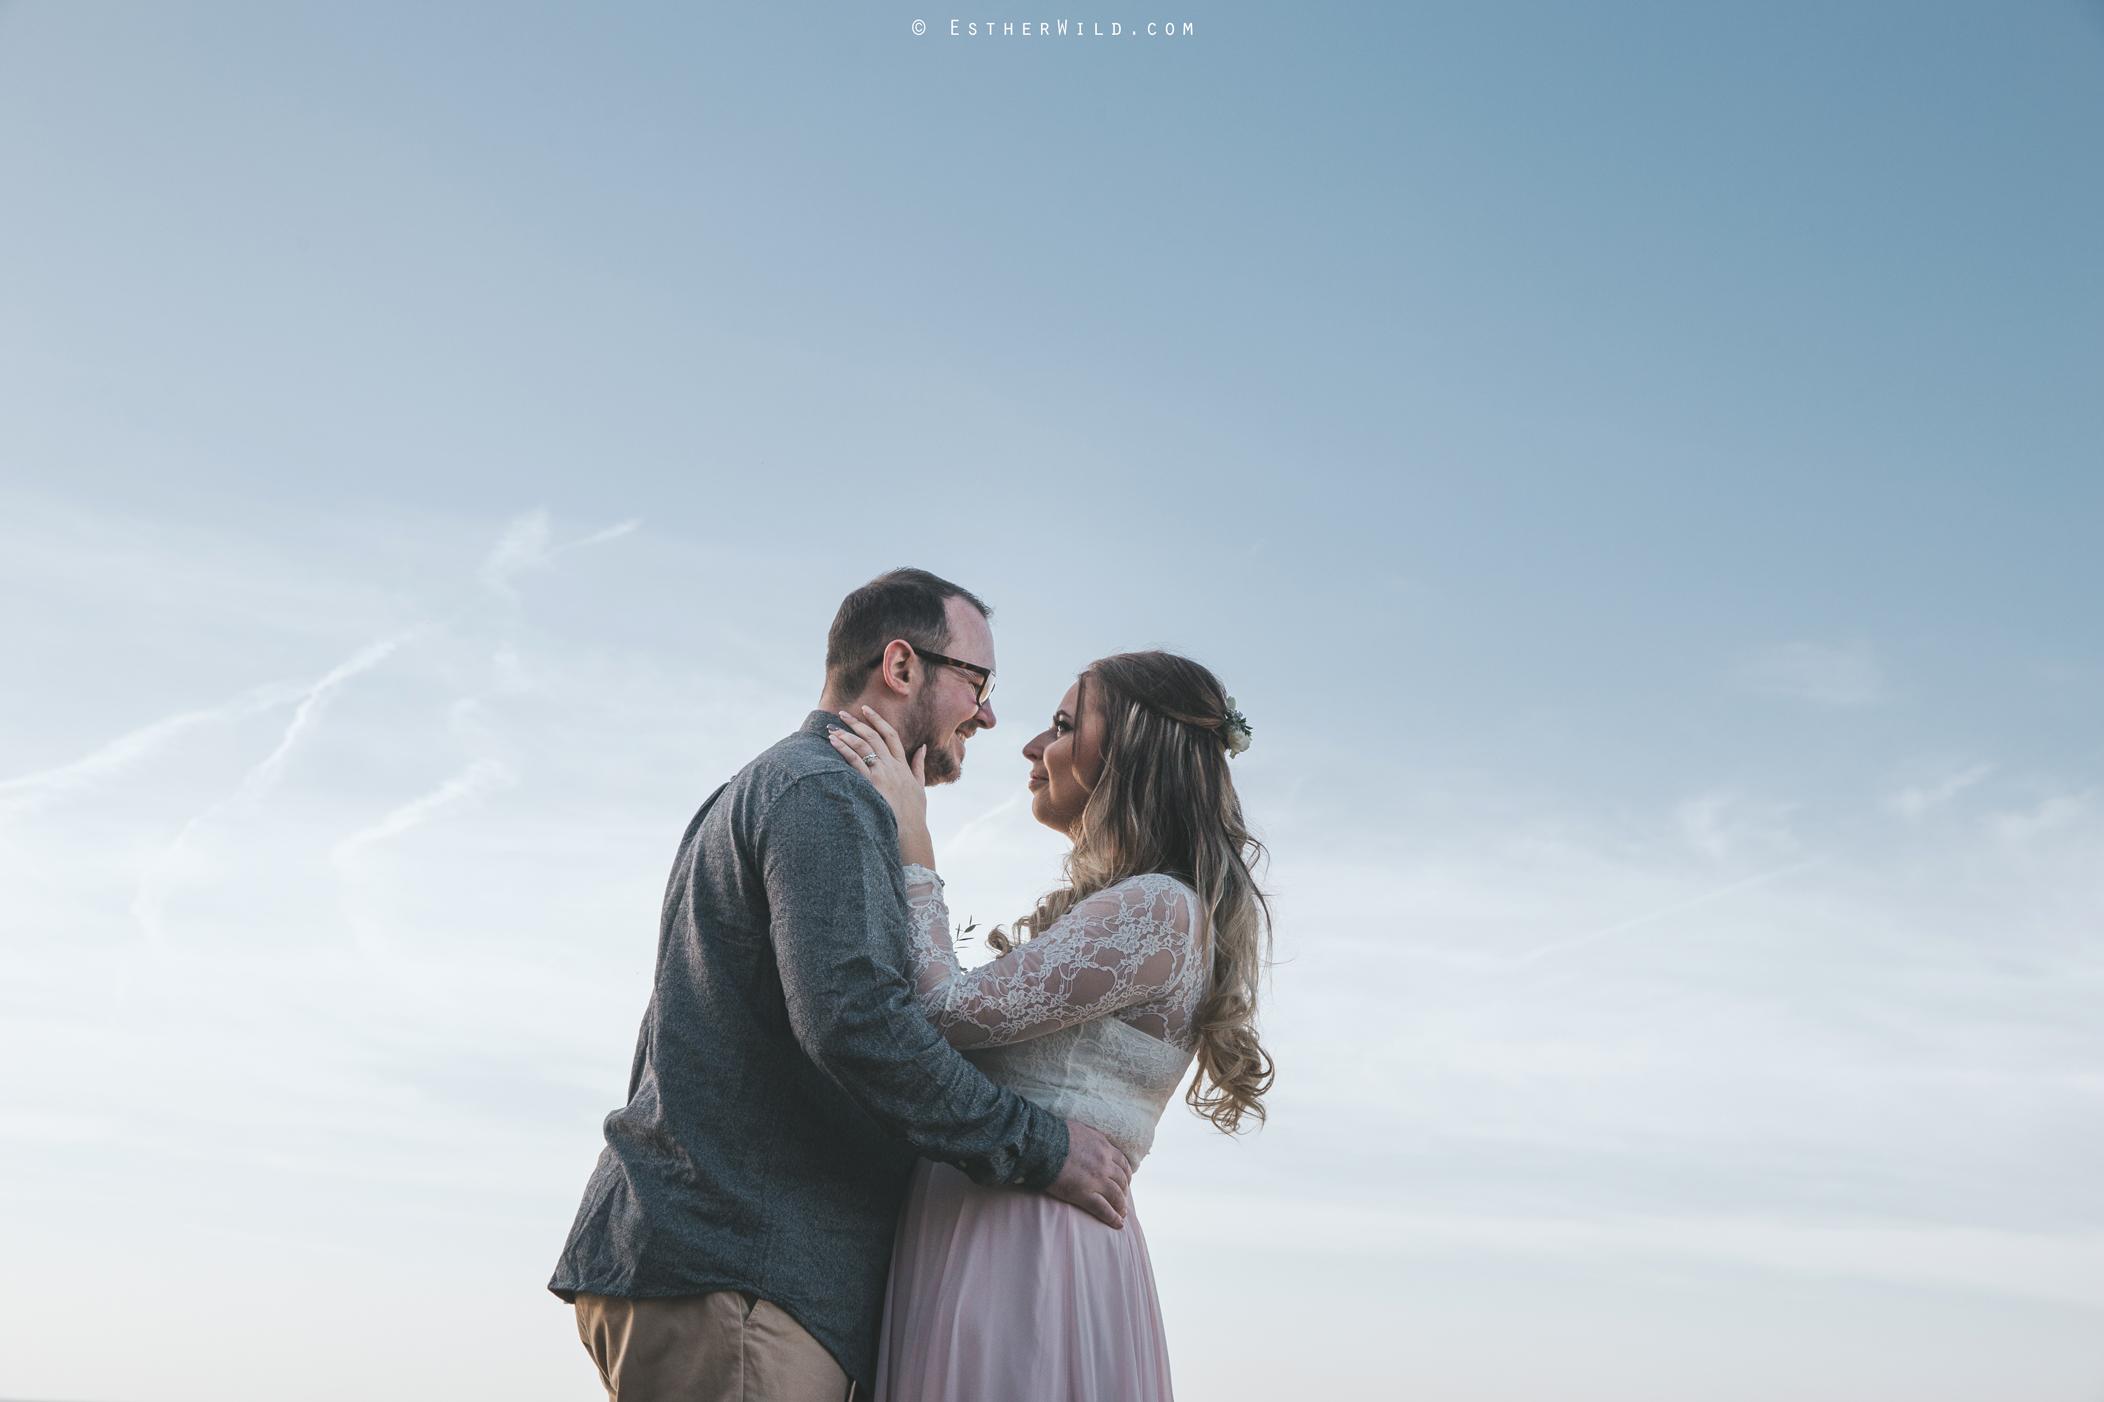 Couple_Anniversary_Wedding_Photography_Hunstanton_Norfolk_Esther_Wild_Share_Copy_IMG_8611.jpg